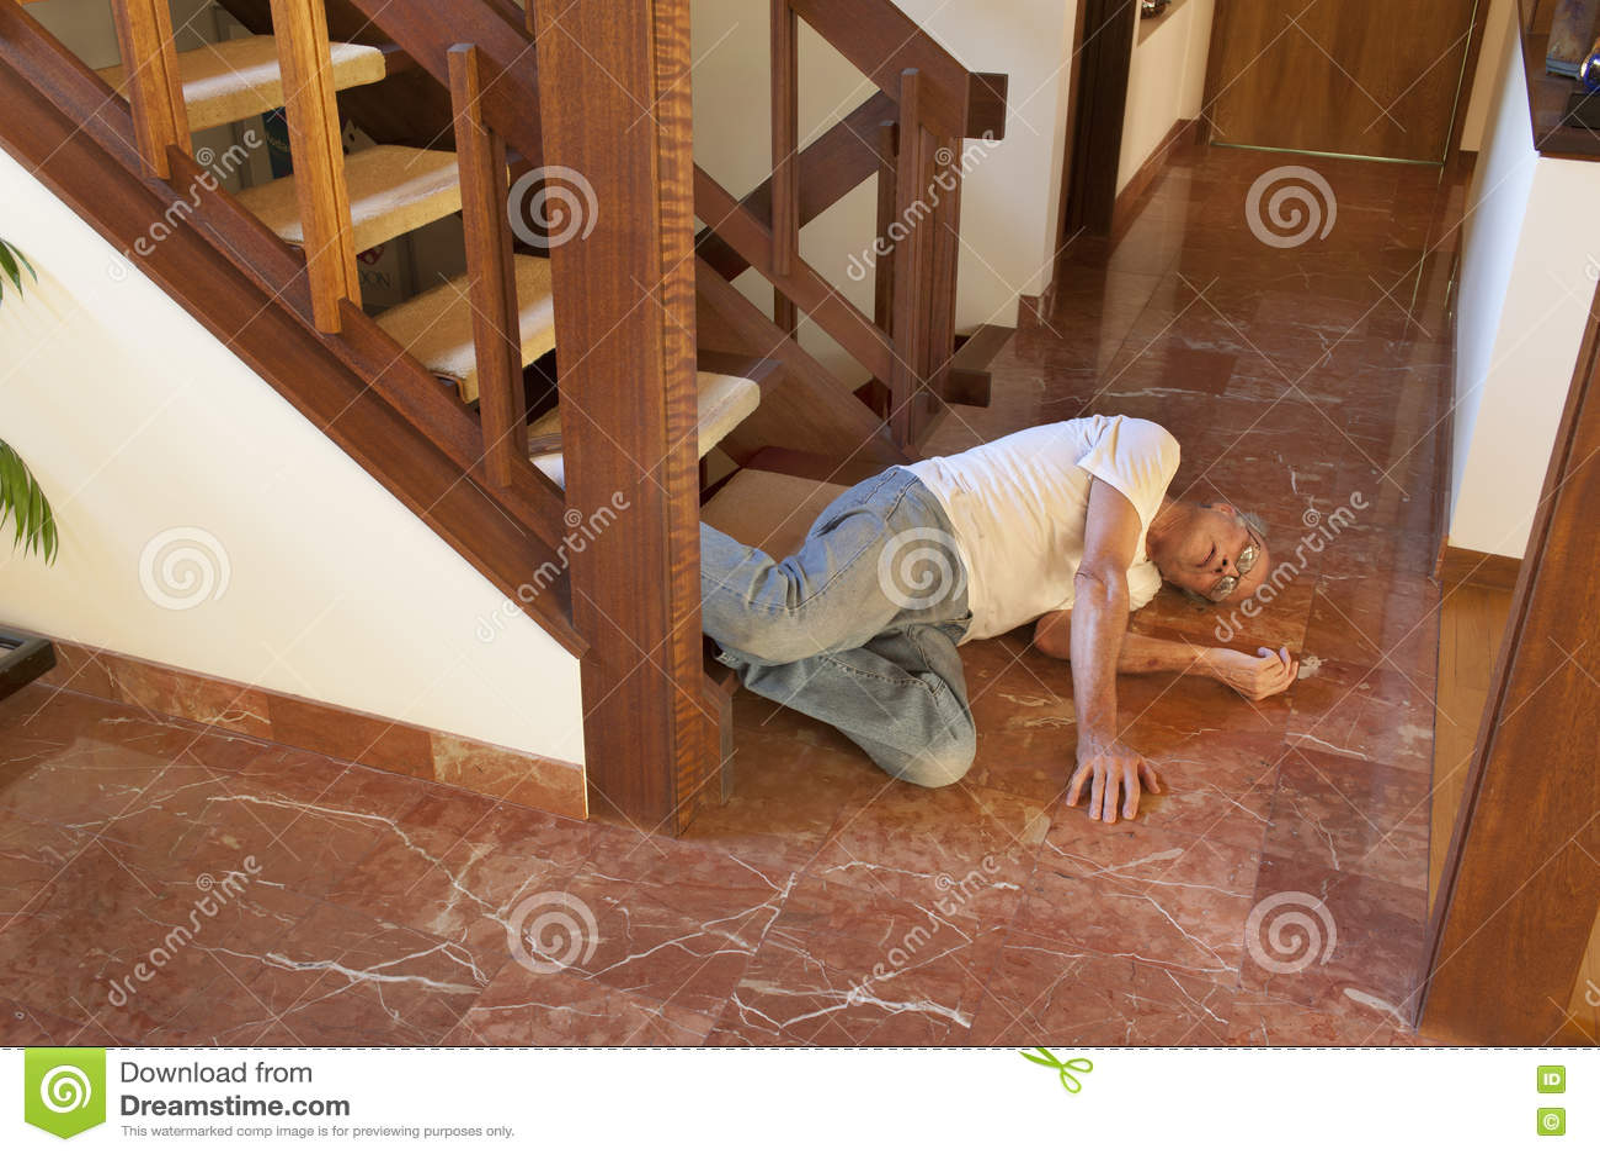 I fell down on the floor thefloors co for Down floor